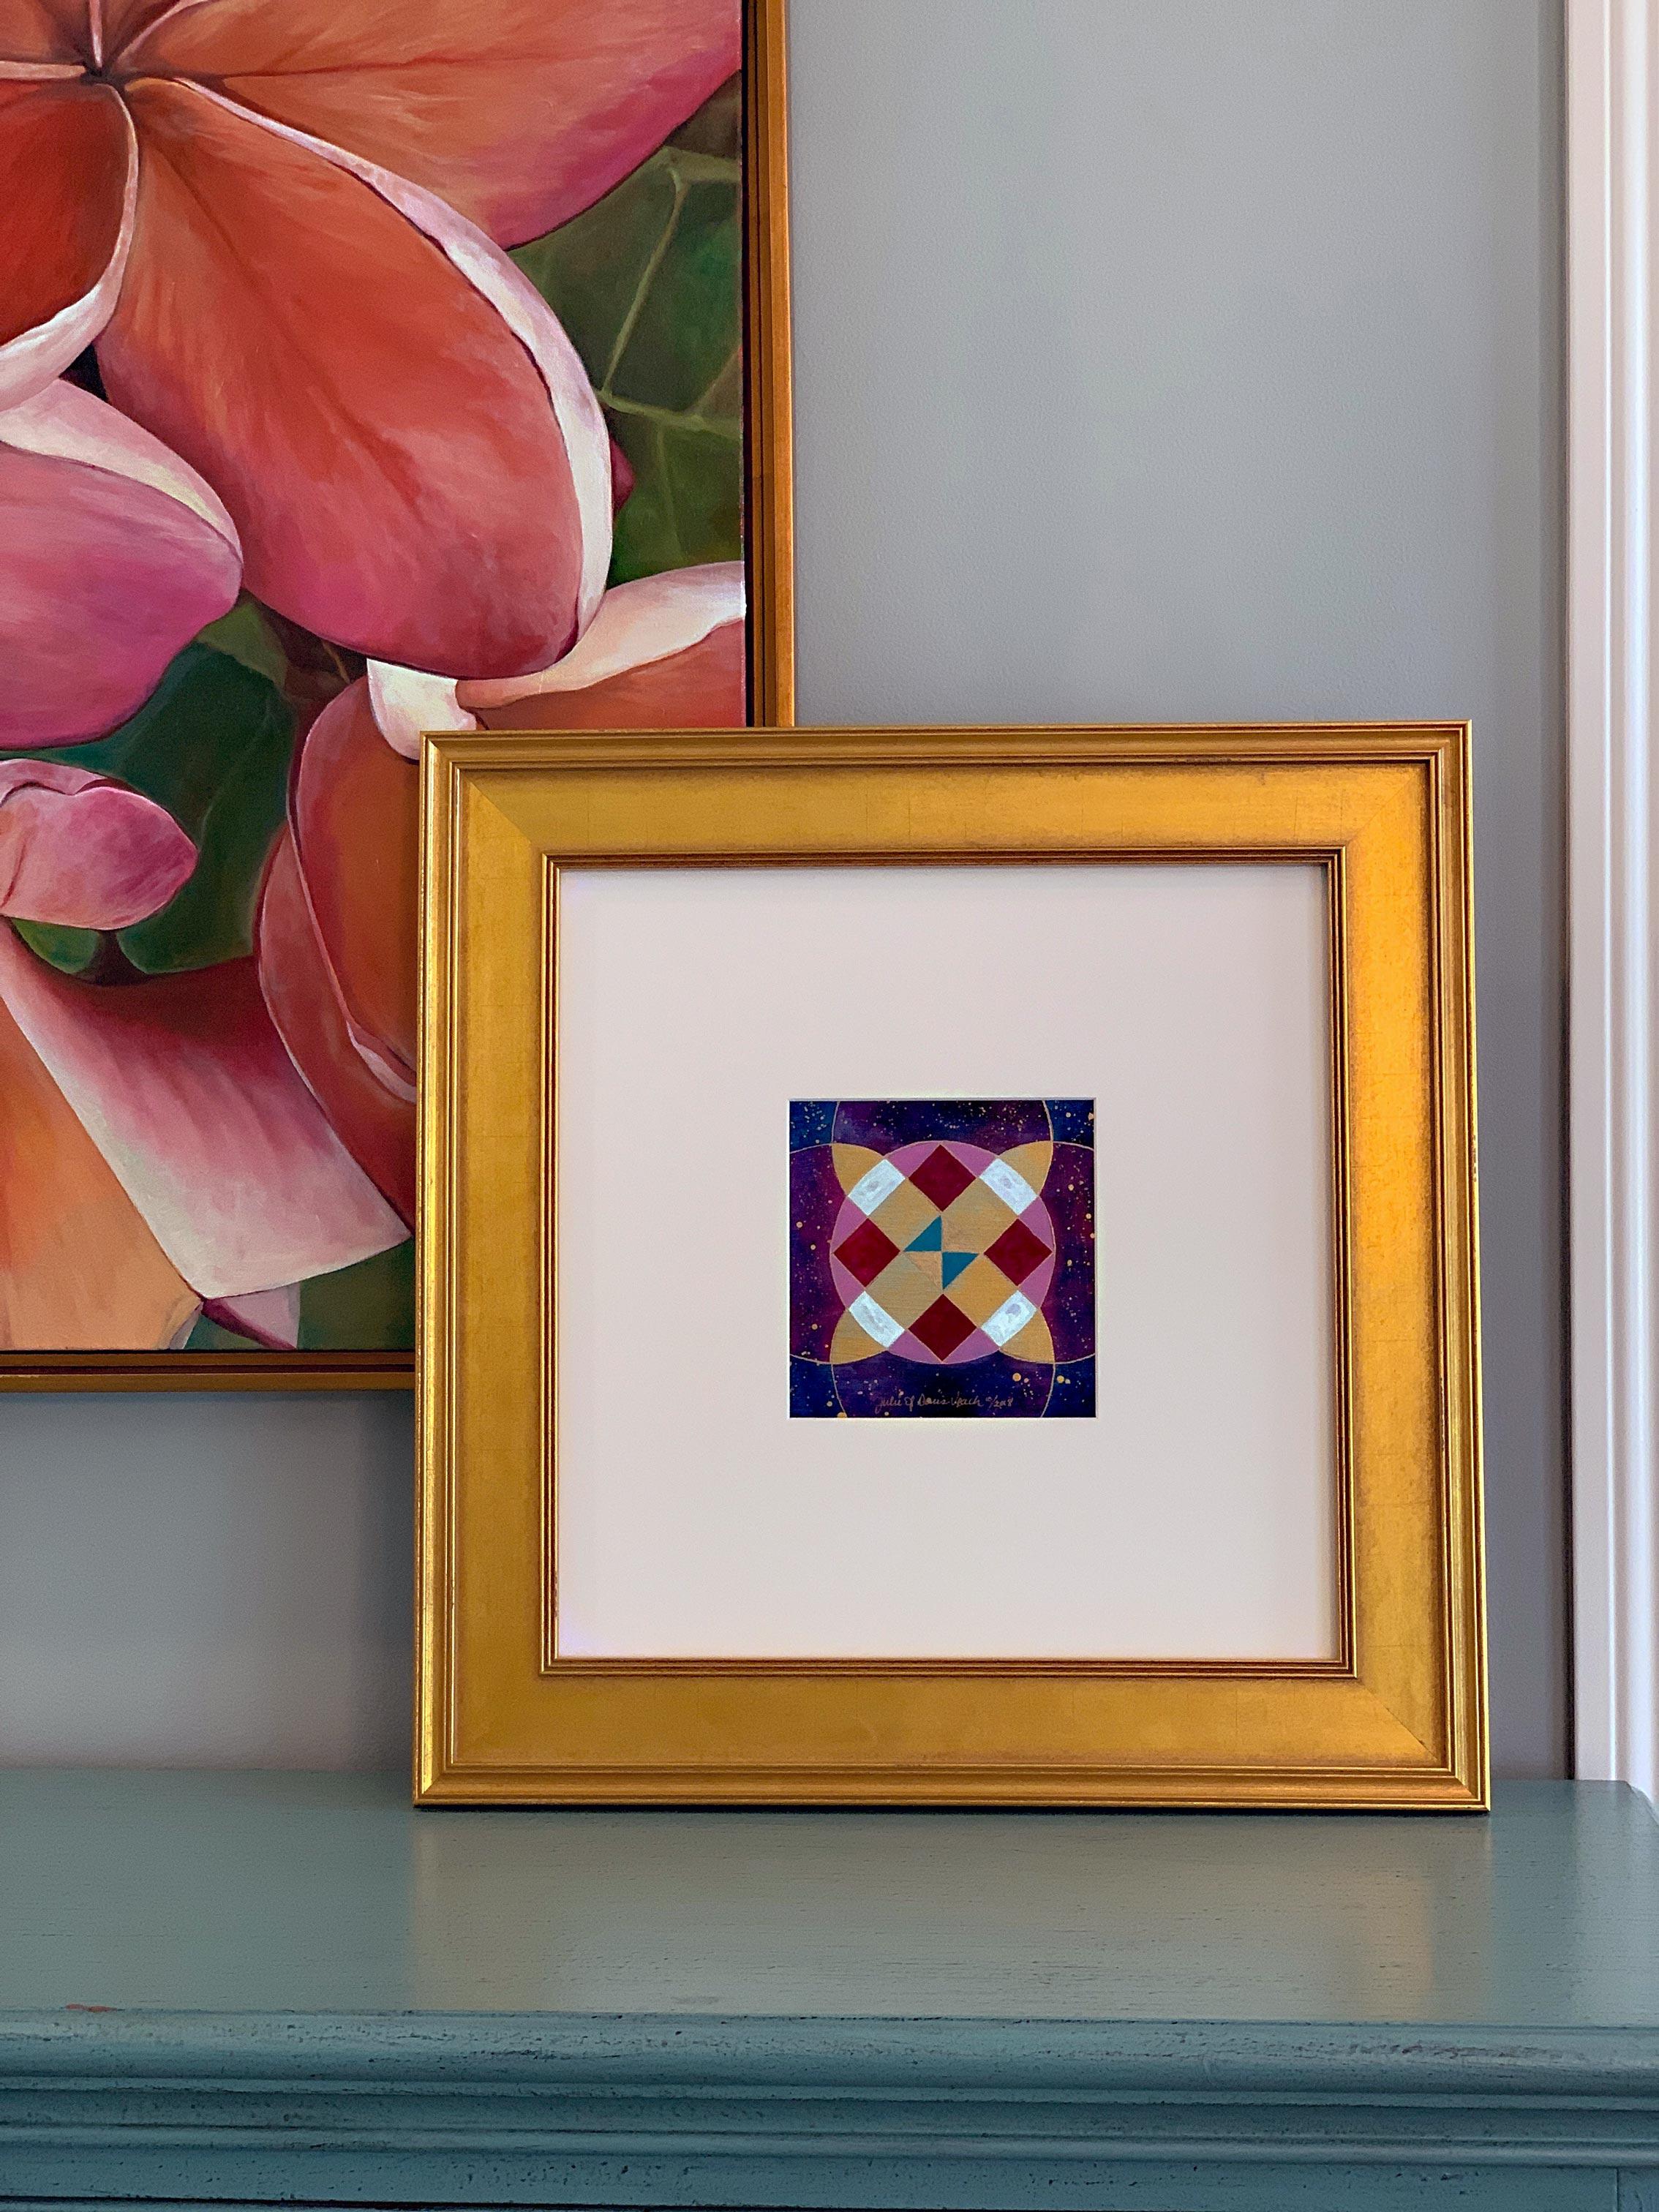 Julie Davis Veach  Beyond Balance 2018 6.5x6.5in. Acrylic on Paper (framed)